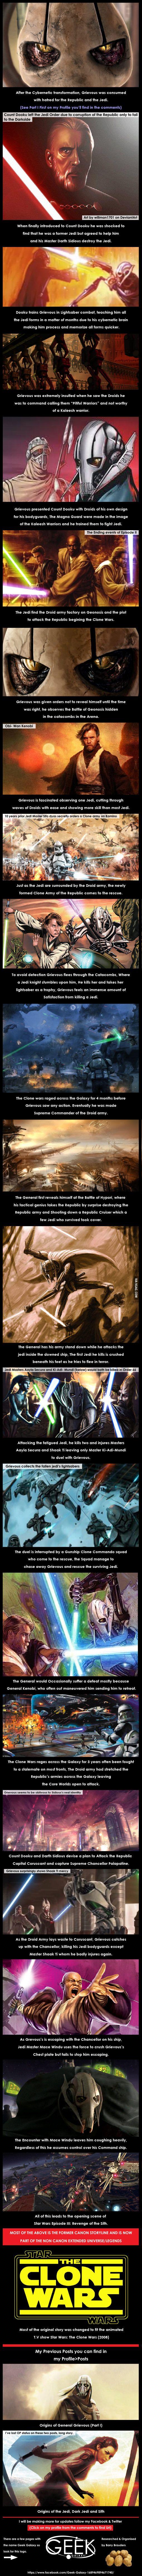 Origins of General Grievous (Part II) Star Wars History